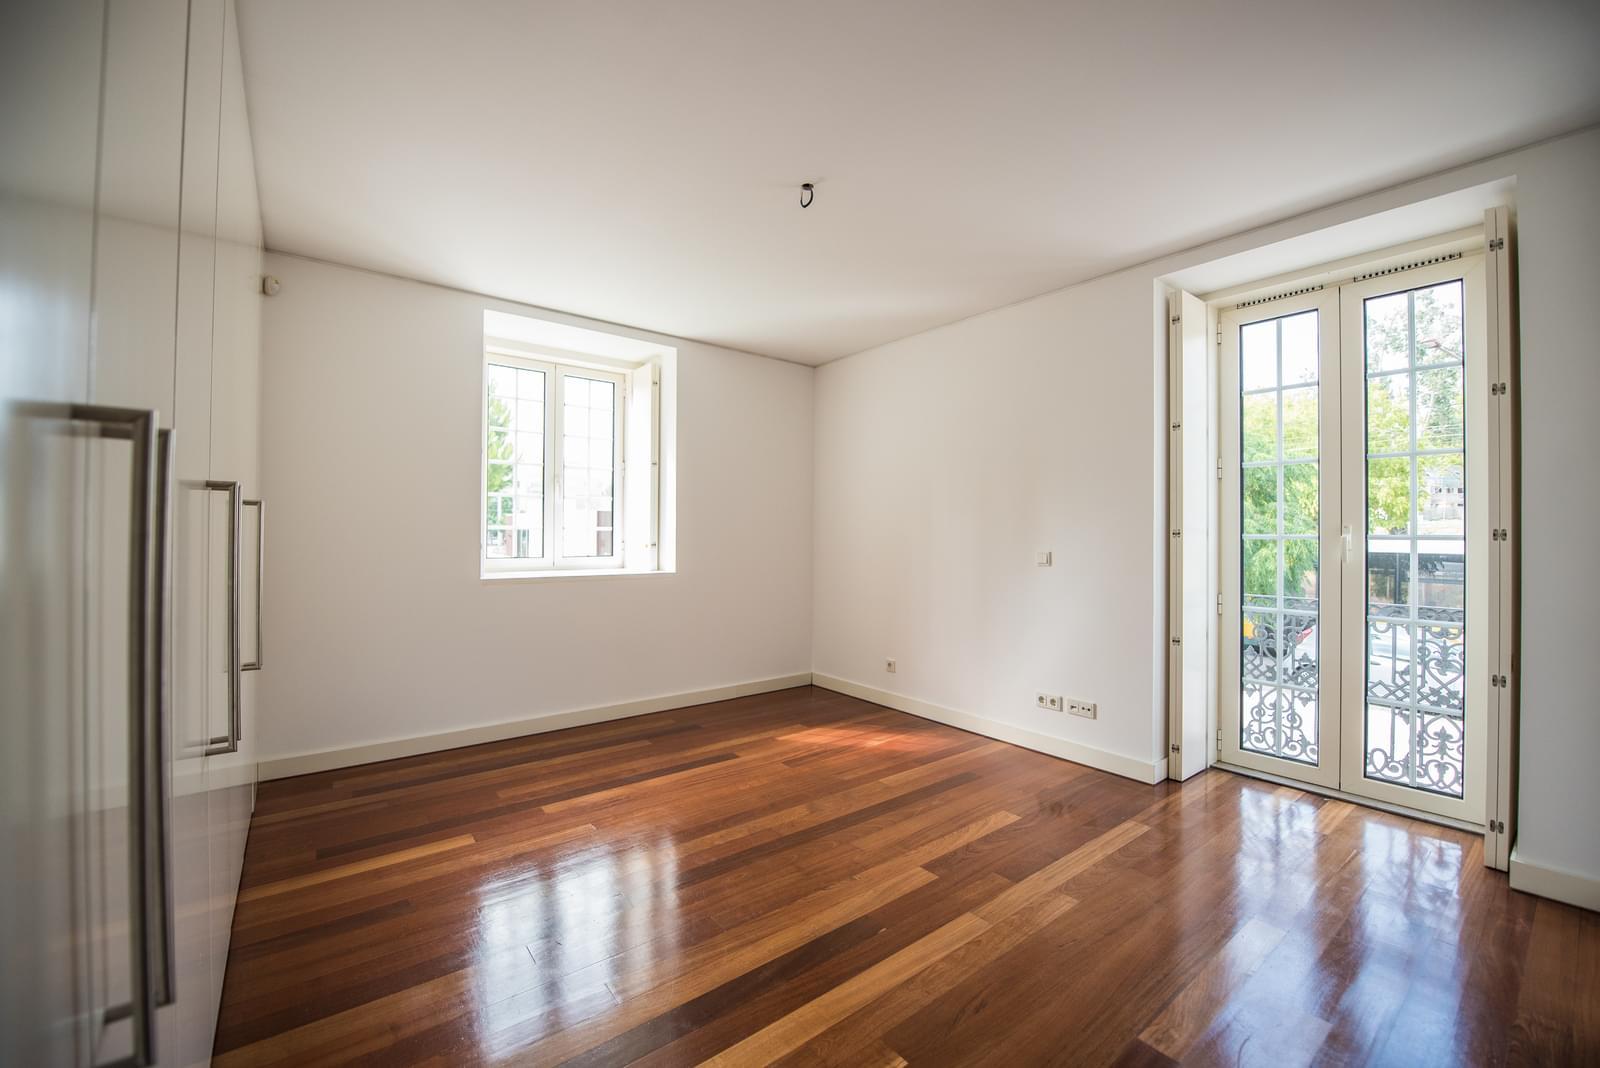 pf19211-apartamento-t4-lisboa-ac0c8b08-e308-4a93-aad7-c4a14408b13c